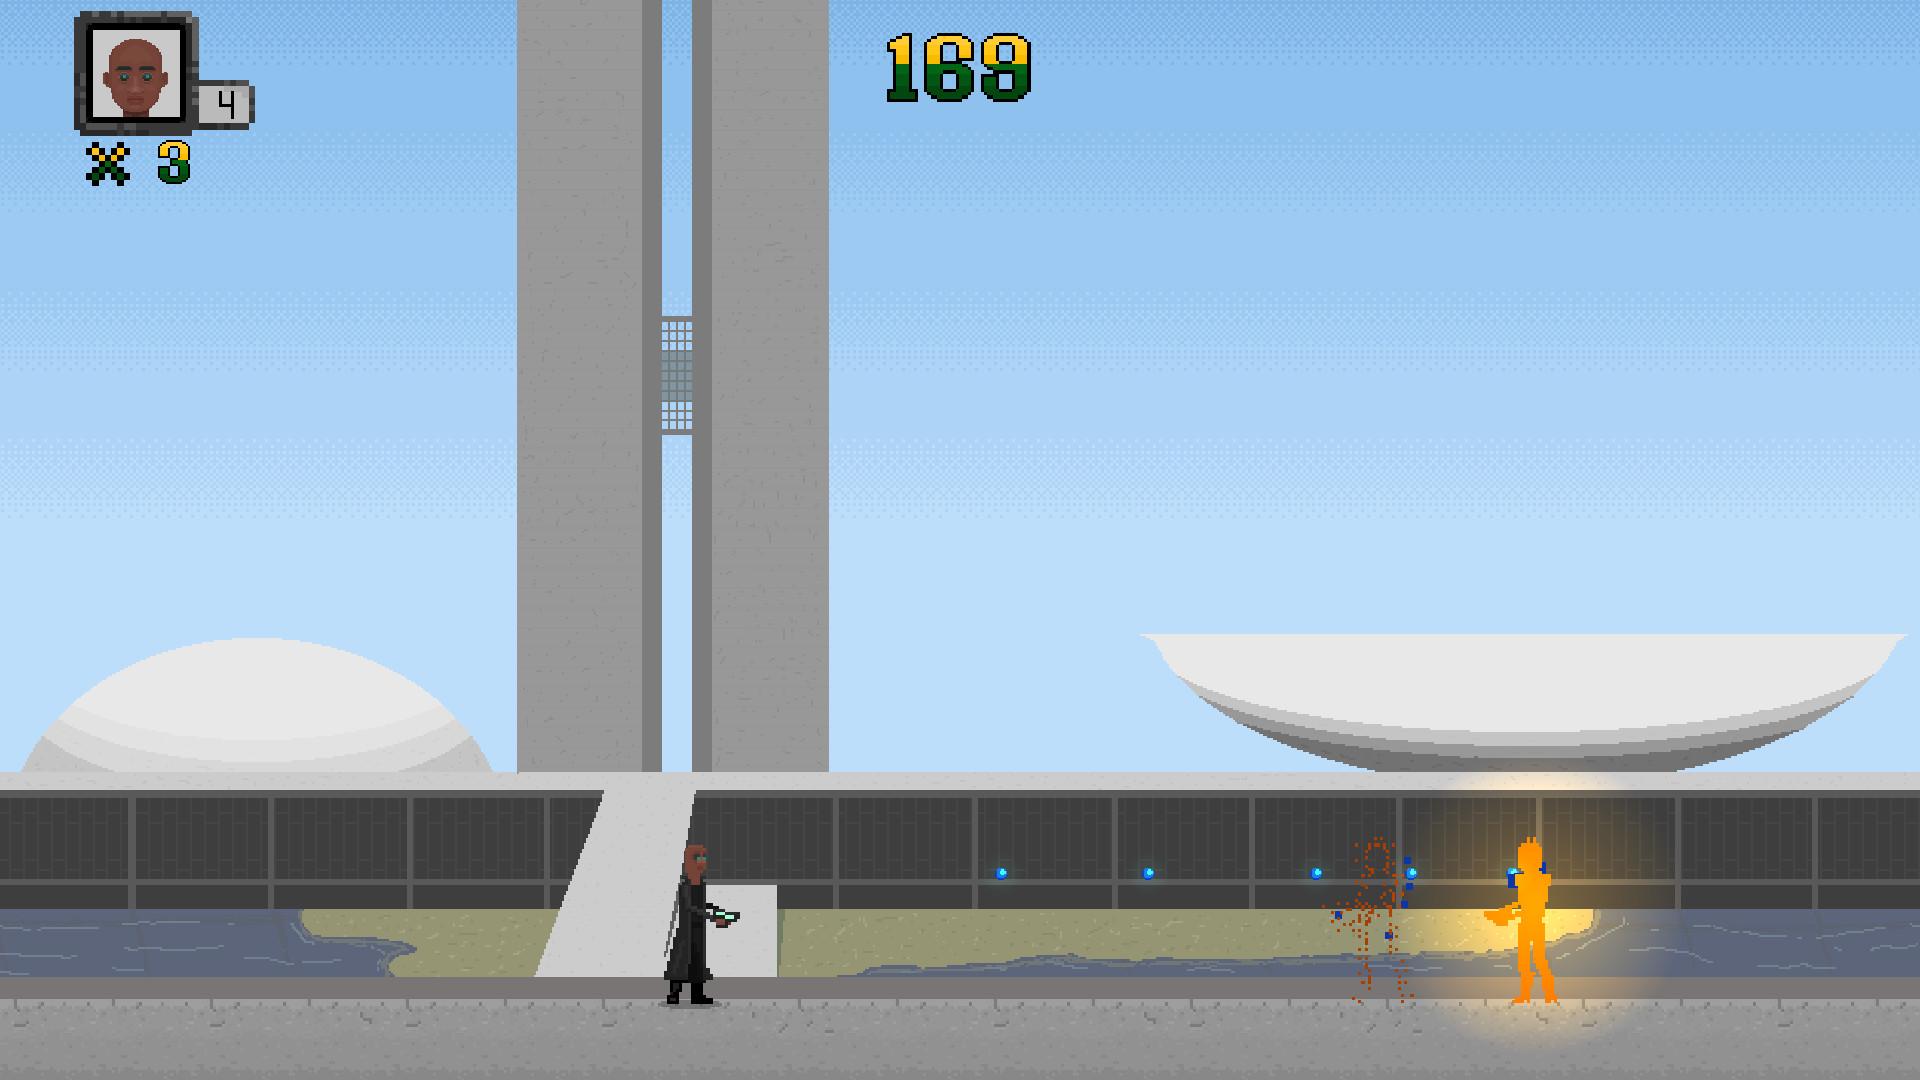 FEB - Brazilian Elite Force screenshot